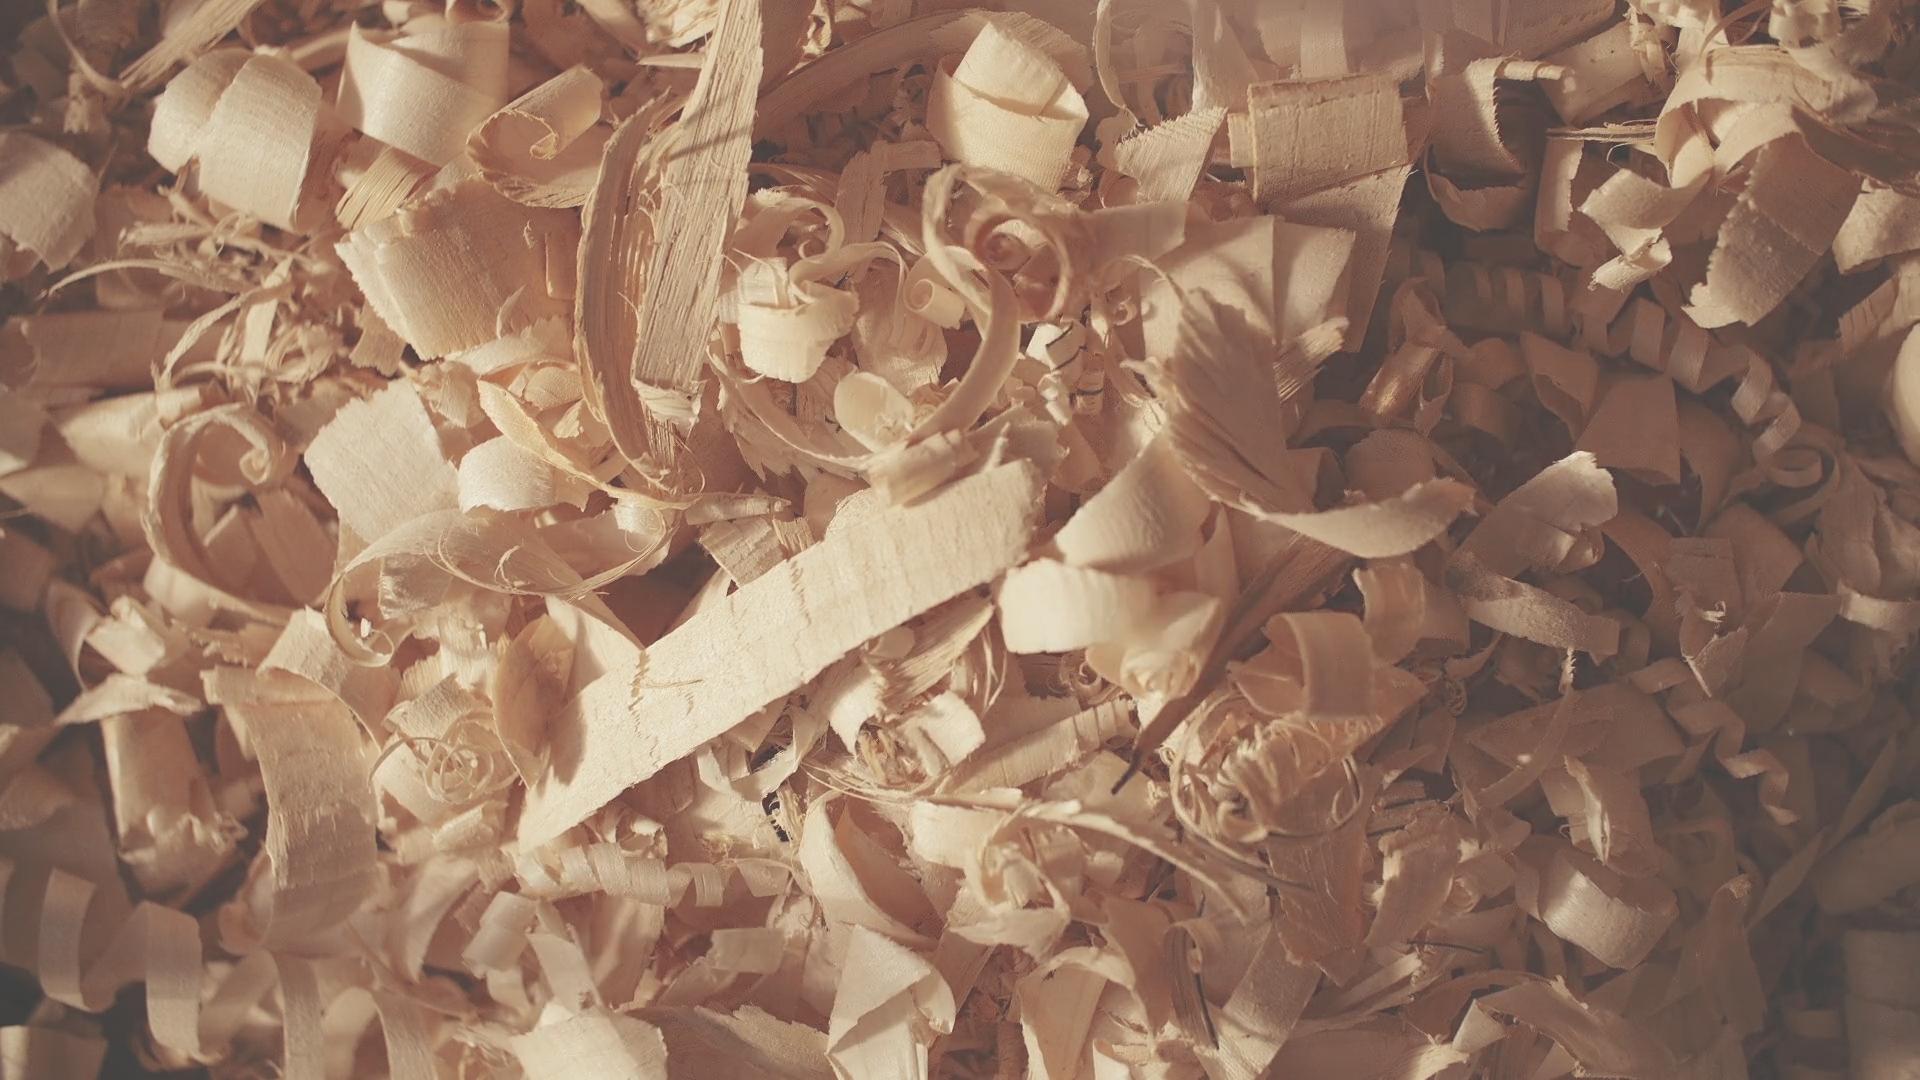 Newbery - The Craft of Bat Making -